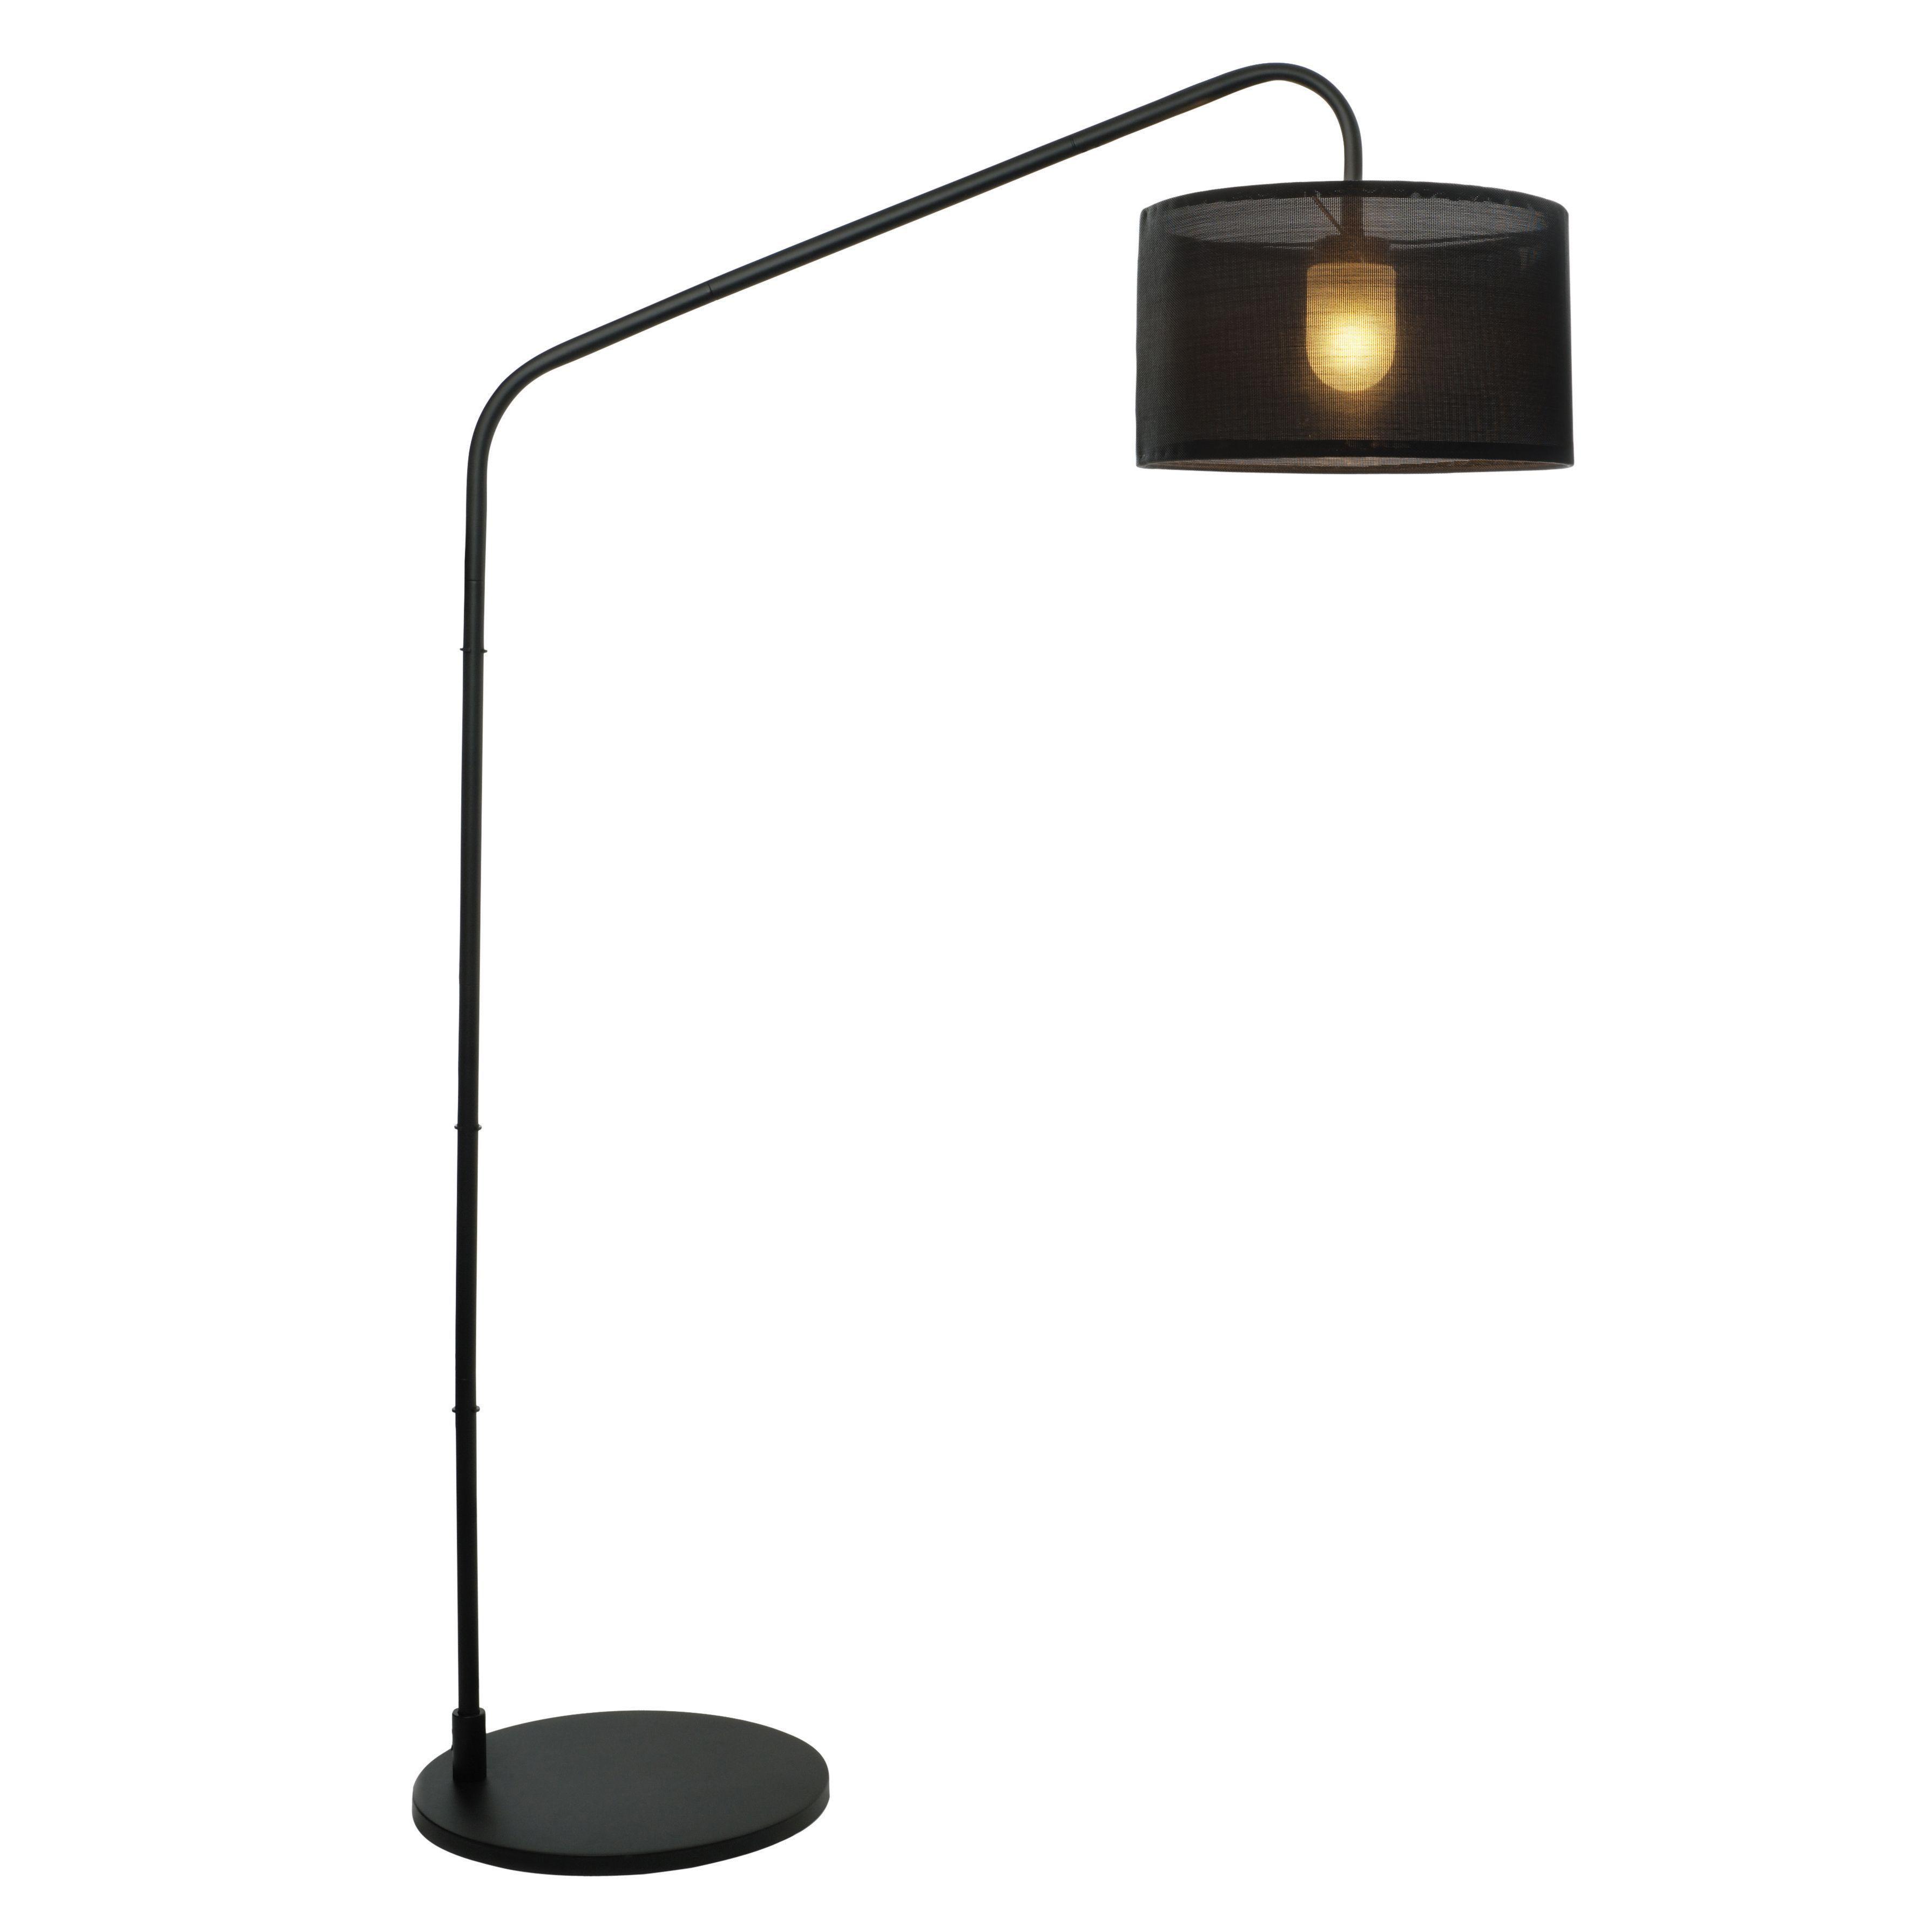 aporia black outdoor floor lamp departments diy at b q. Black Bedroom Furniture Sets. Home Design Ideas